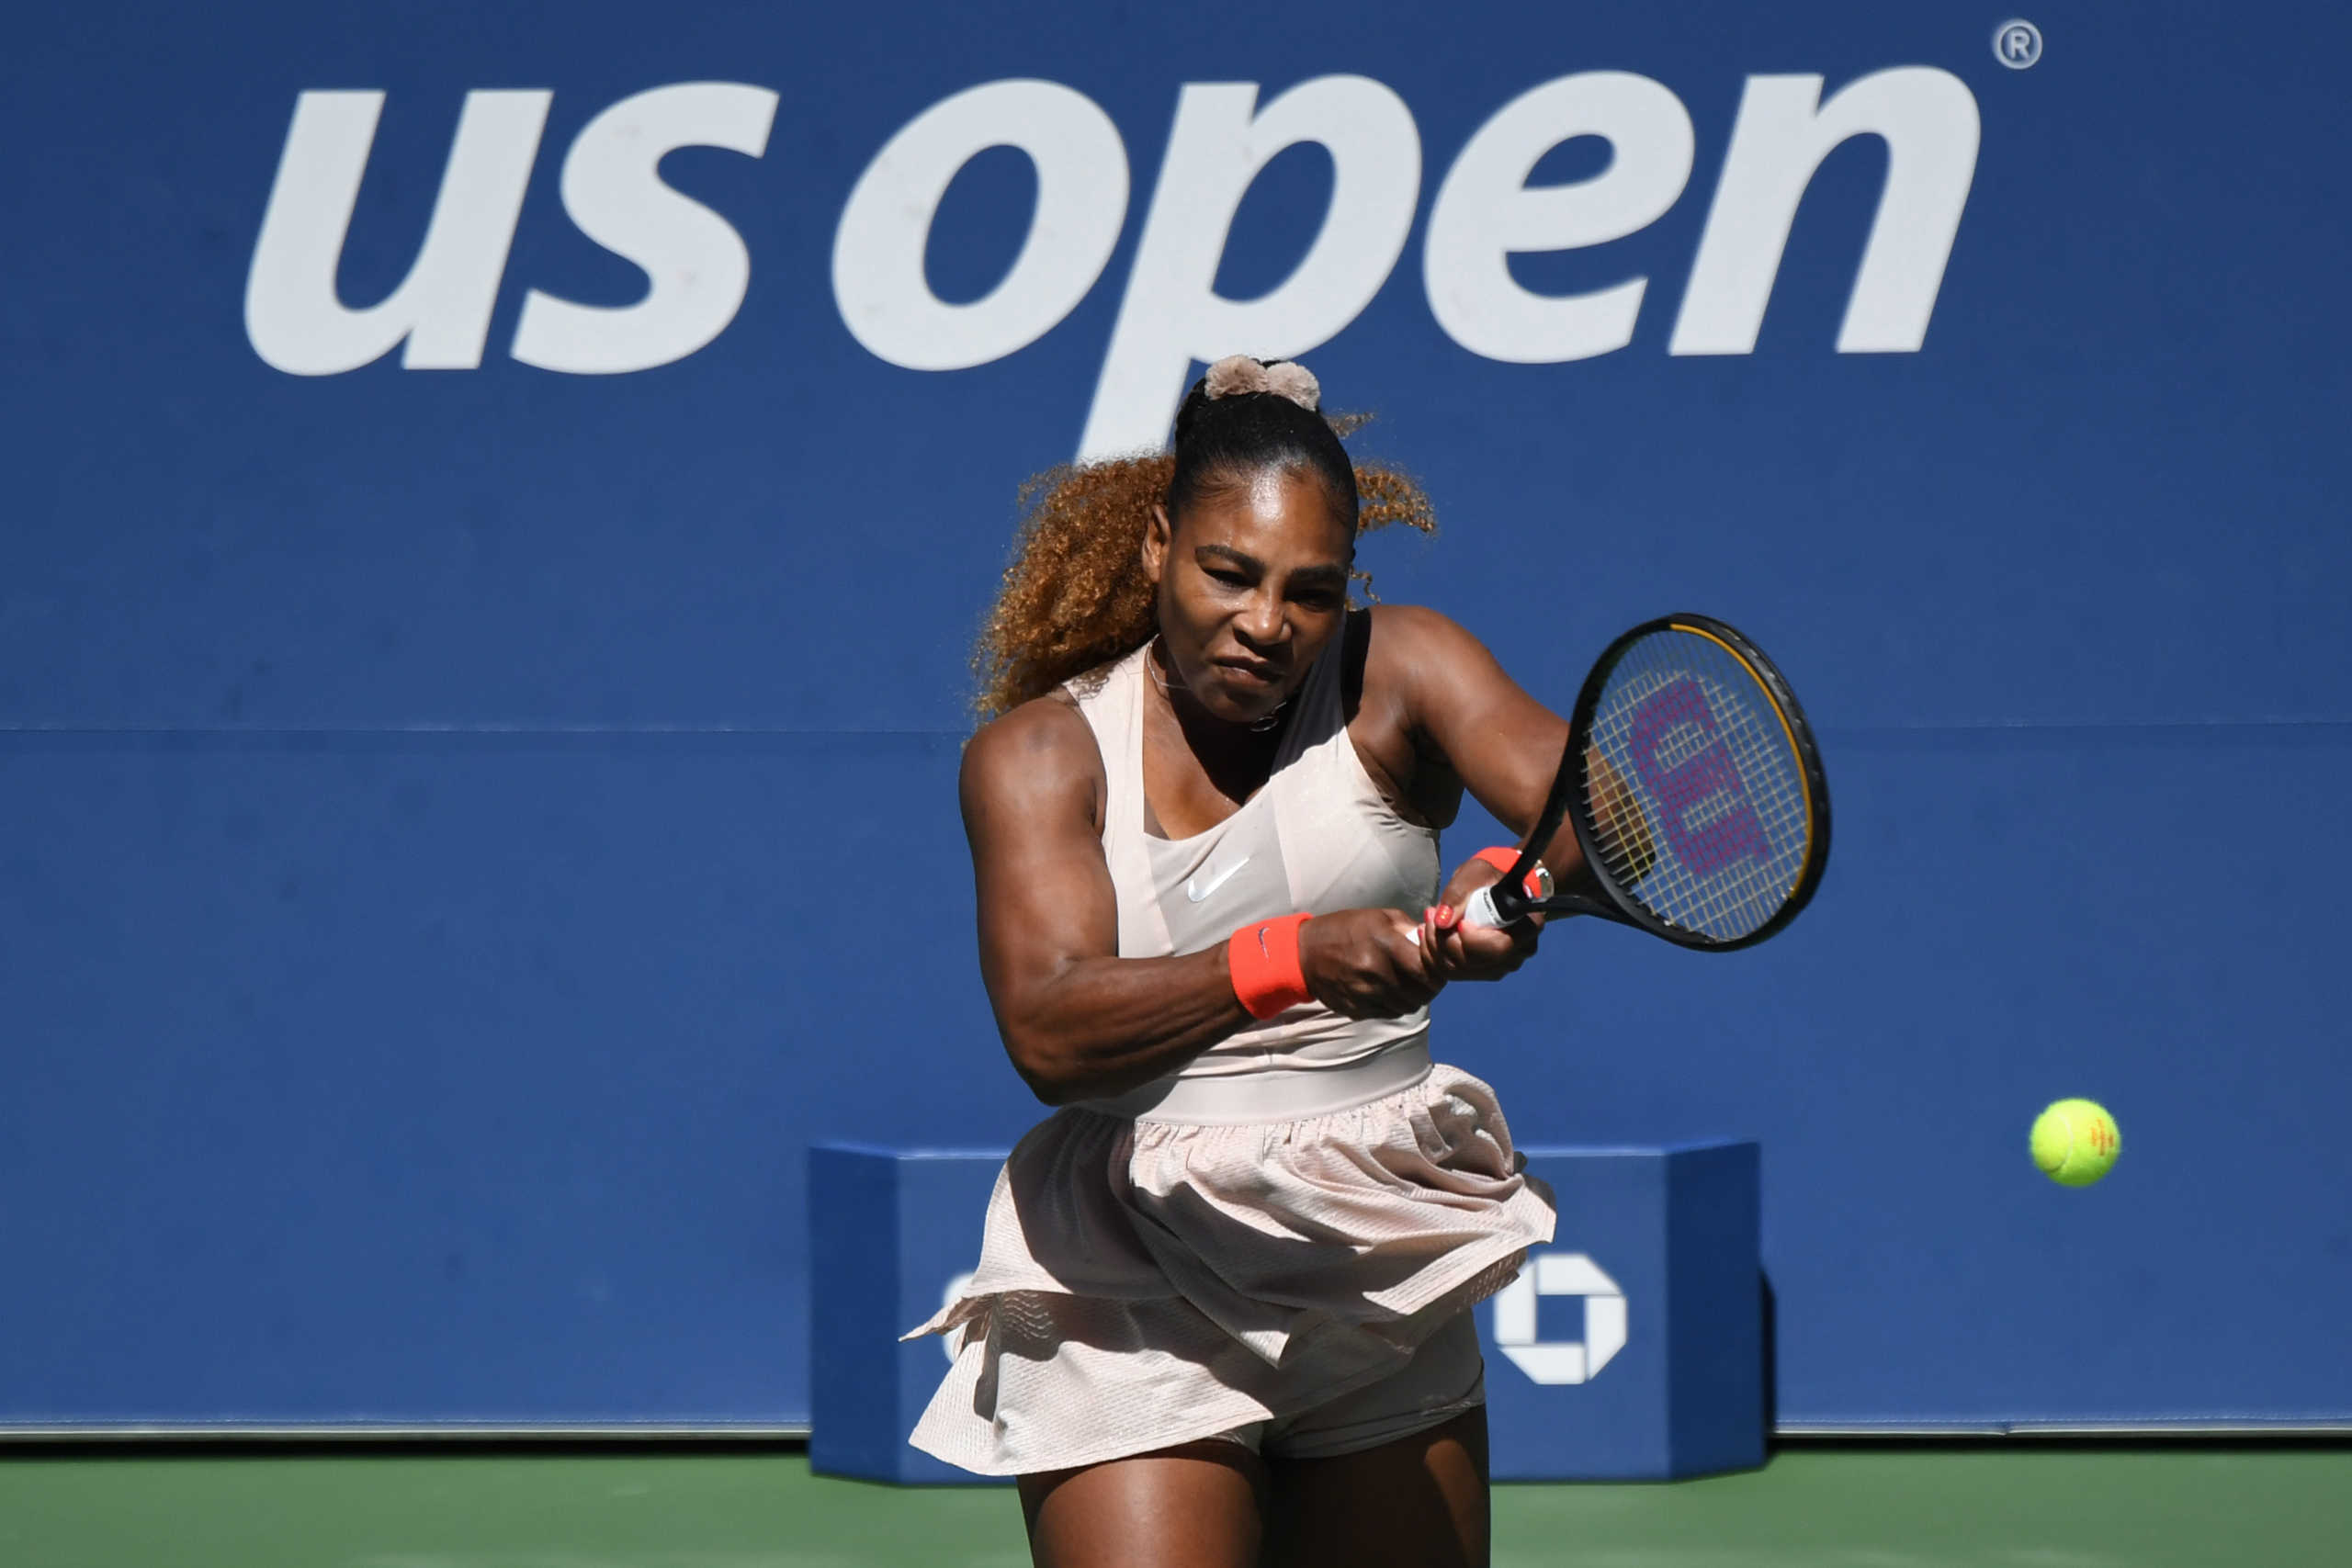 US Open: Τα ζευγάρια των ημιτελικών σε άνδρες και γυναίκες